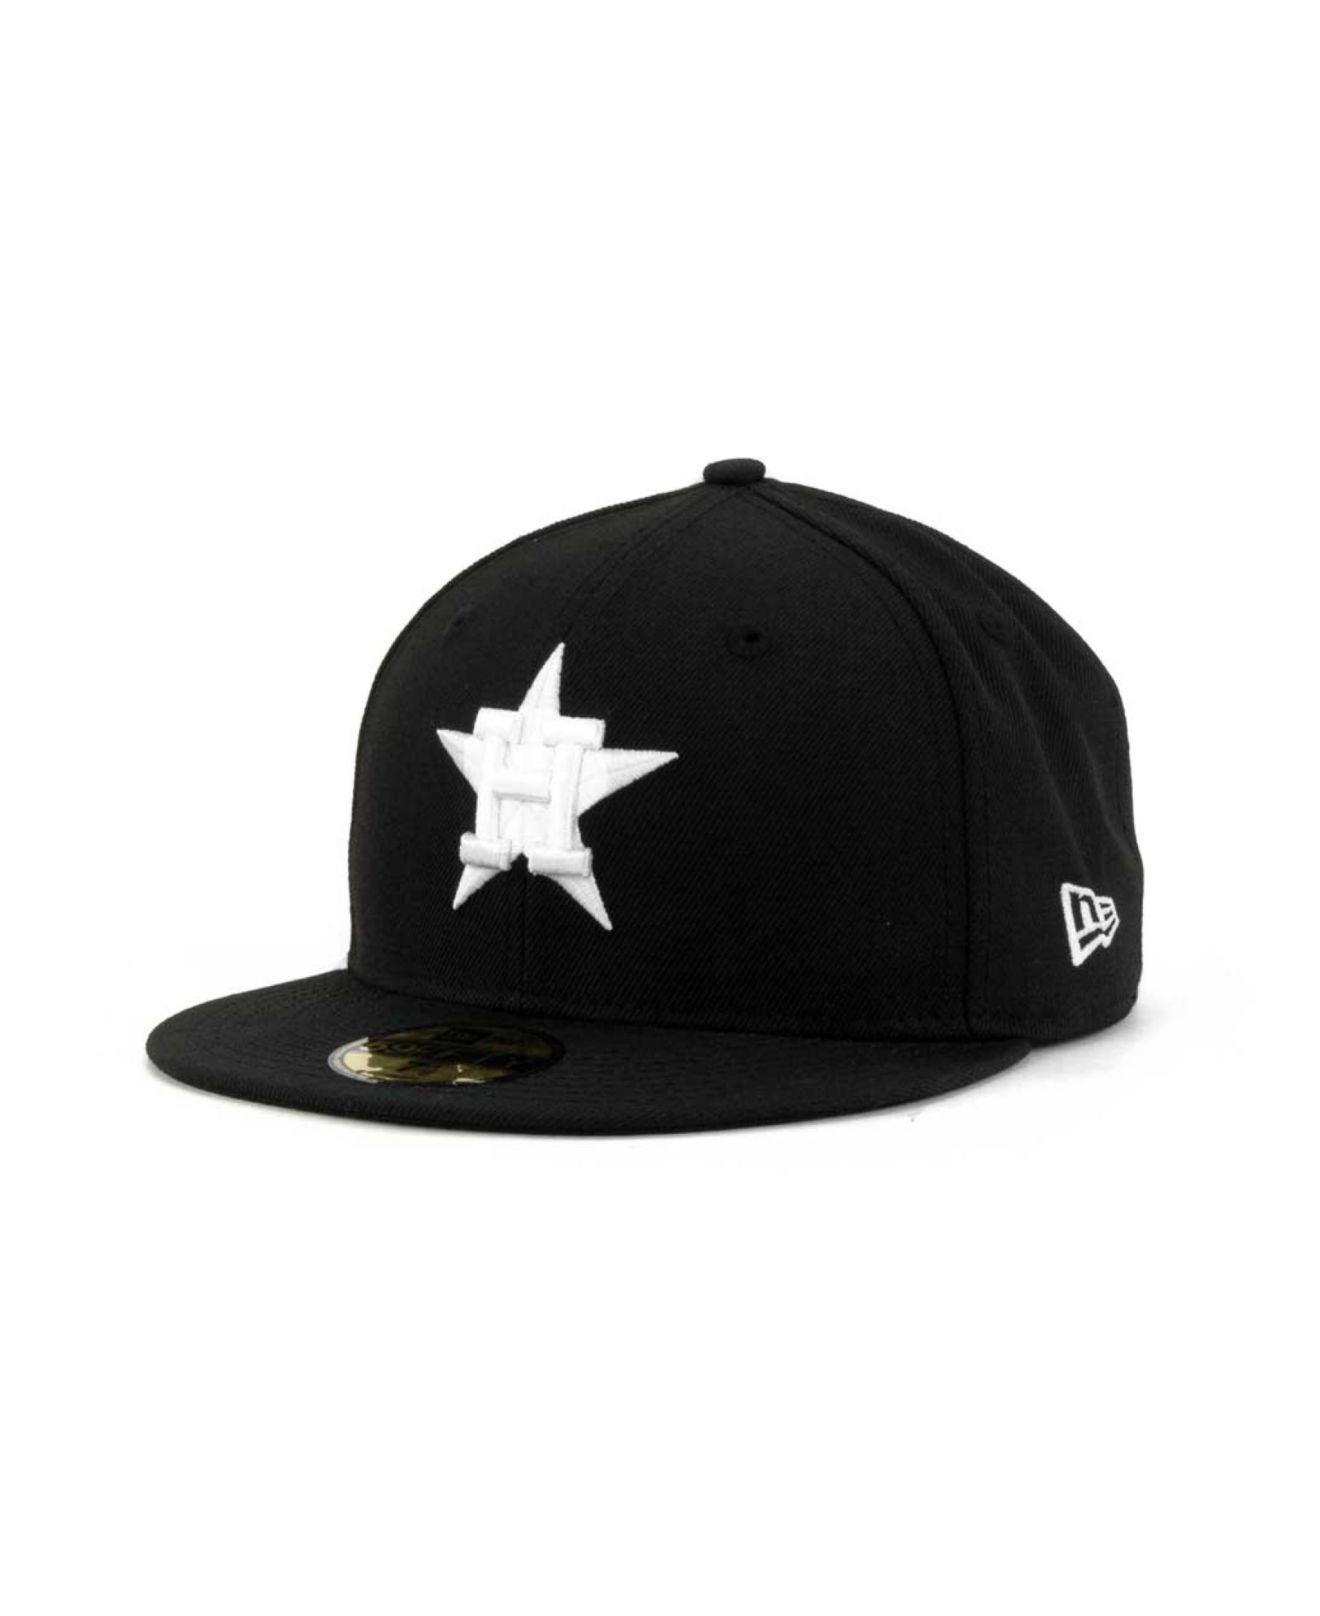 online retailer 8bf9d d6c0a KTZ. Men s Black Houston Astros Mlb B-dub 59fifty Cap